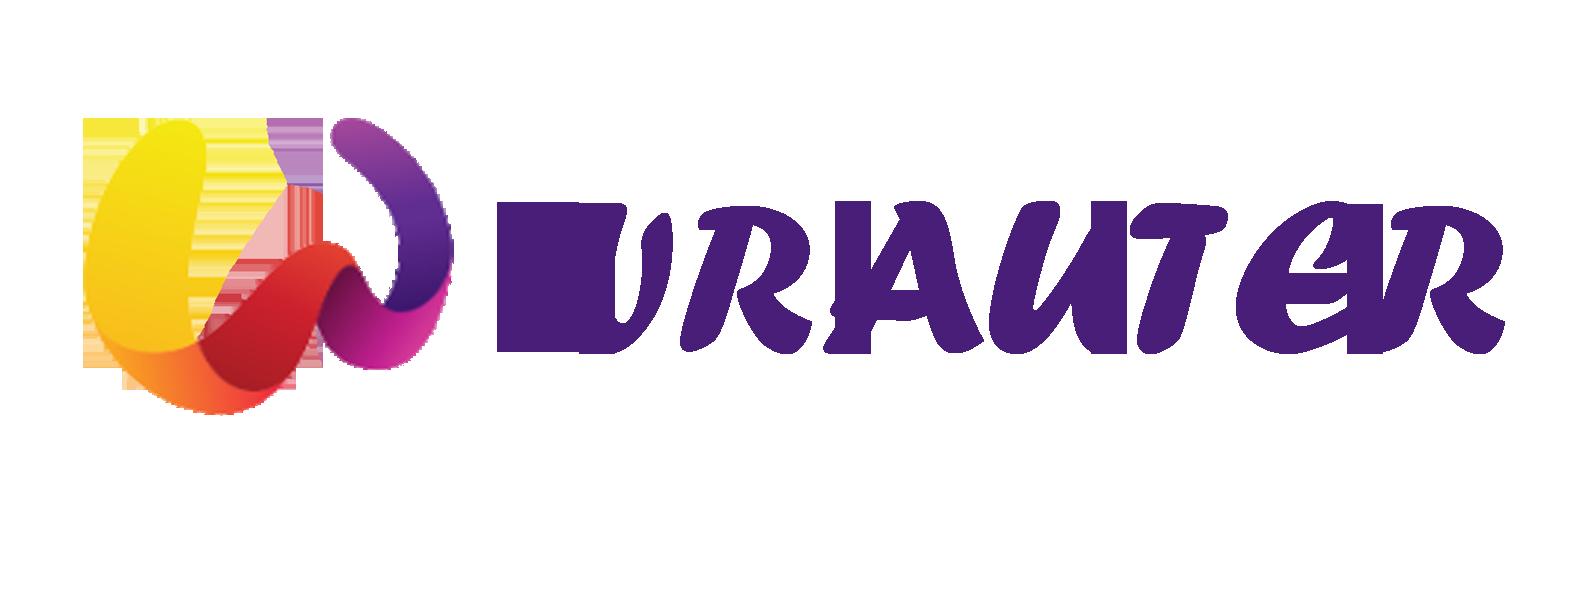 English Wrauter - India's Own Social Media